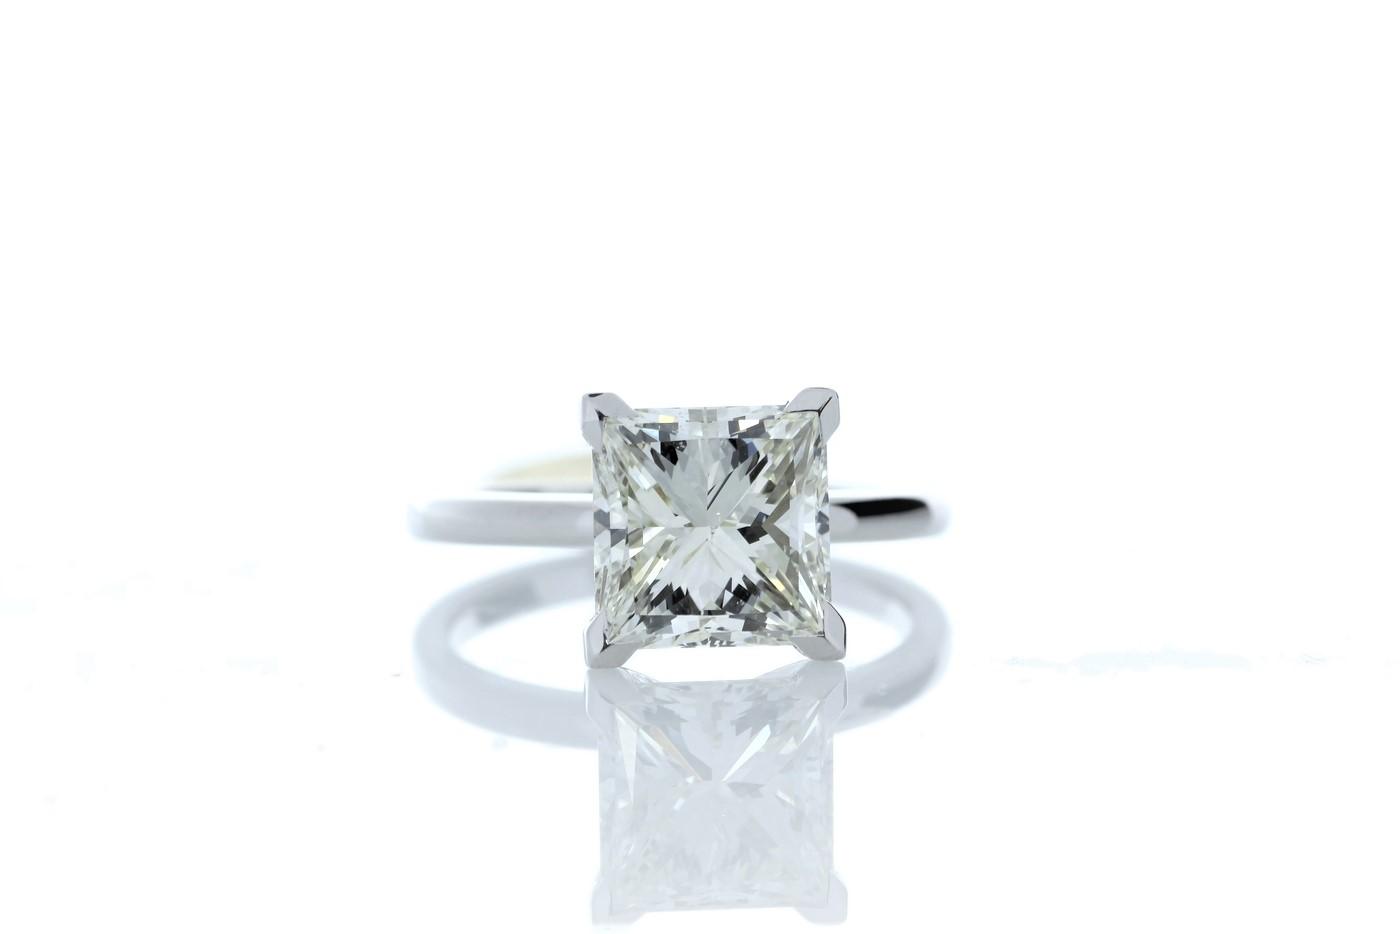 18ct White Gold Princess Cut Diamond Ring 3.09 Carats